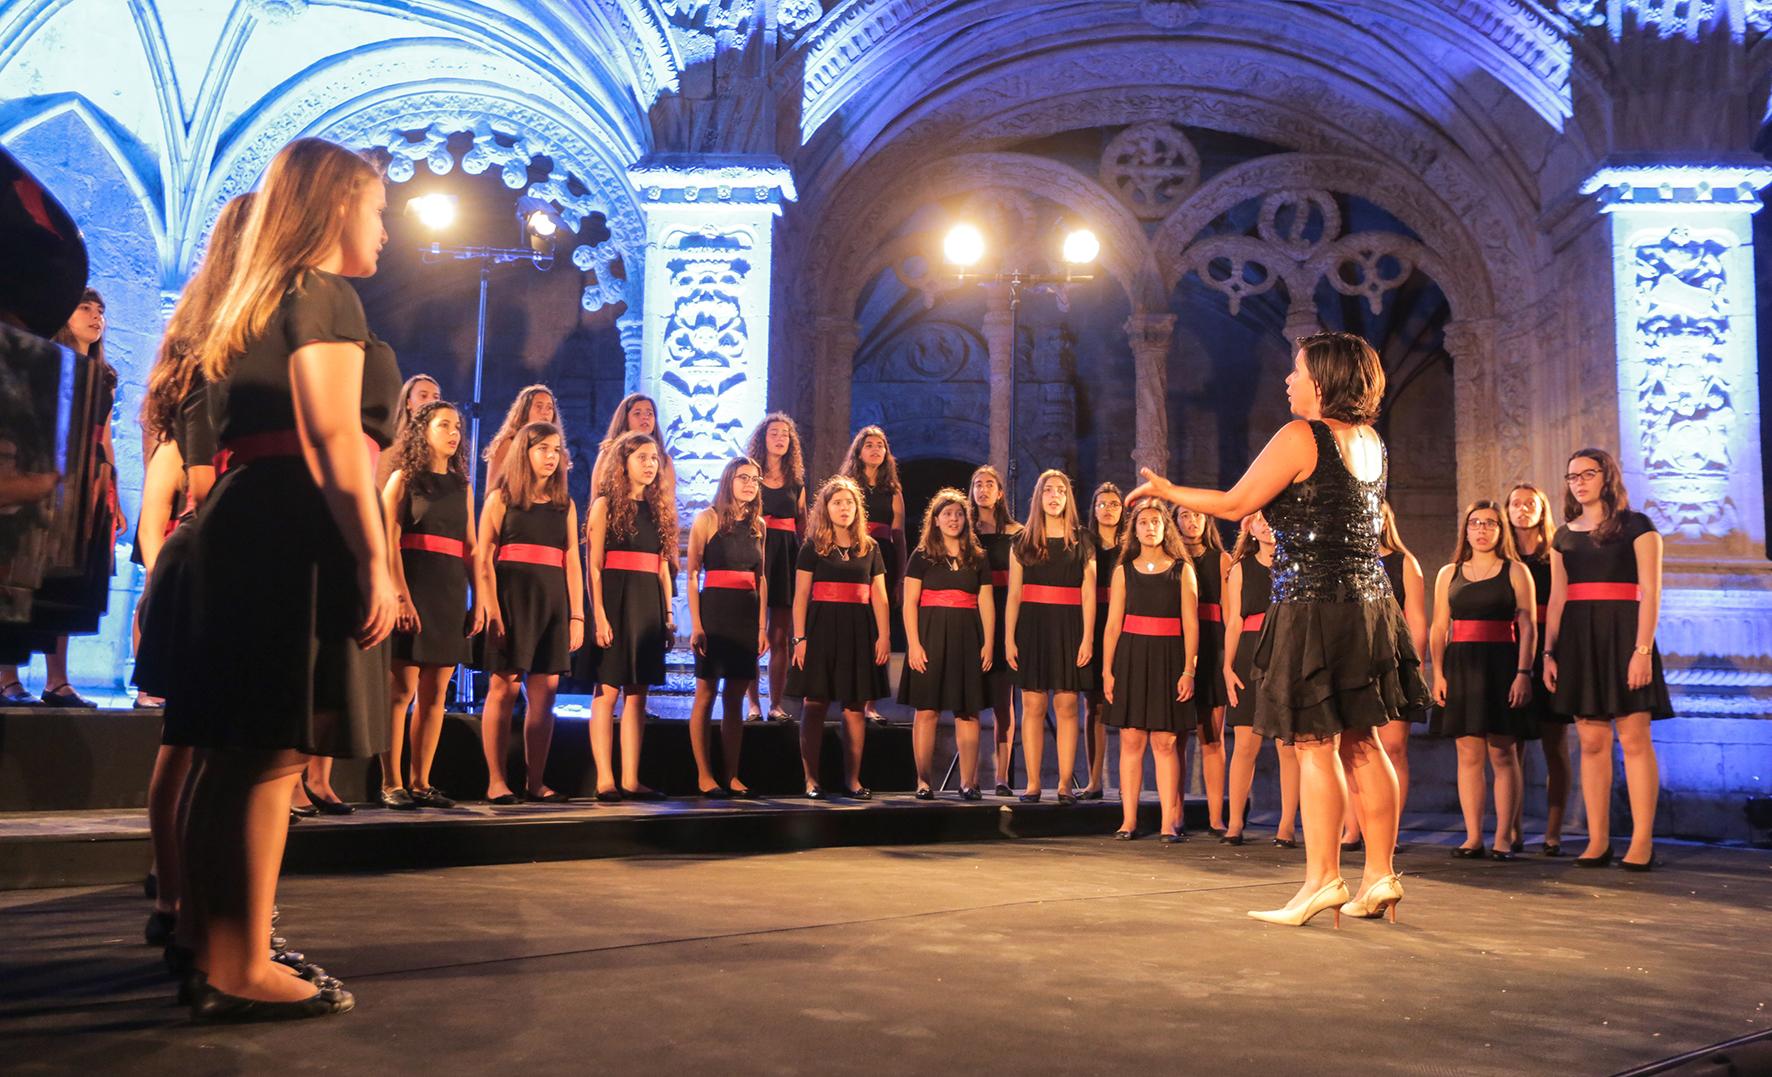 IFCM - International Federation for Choral Music